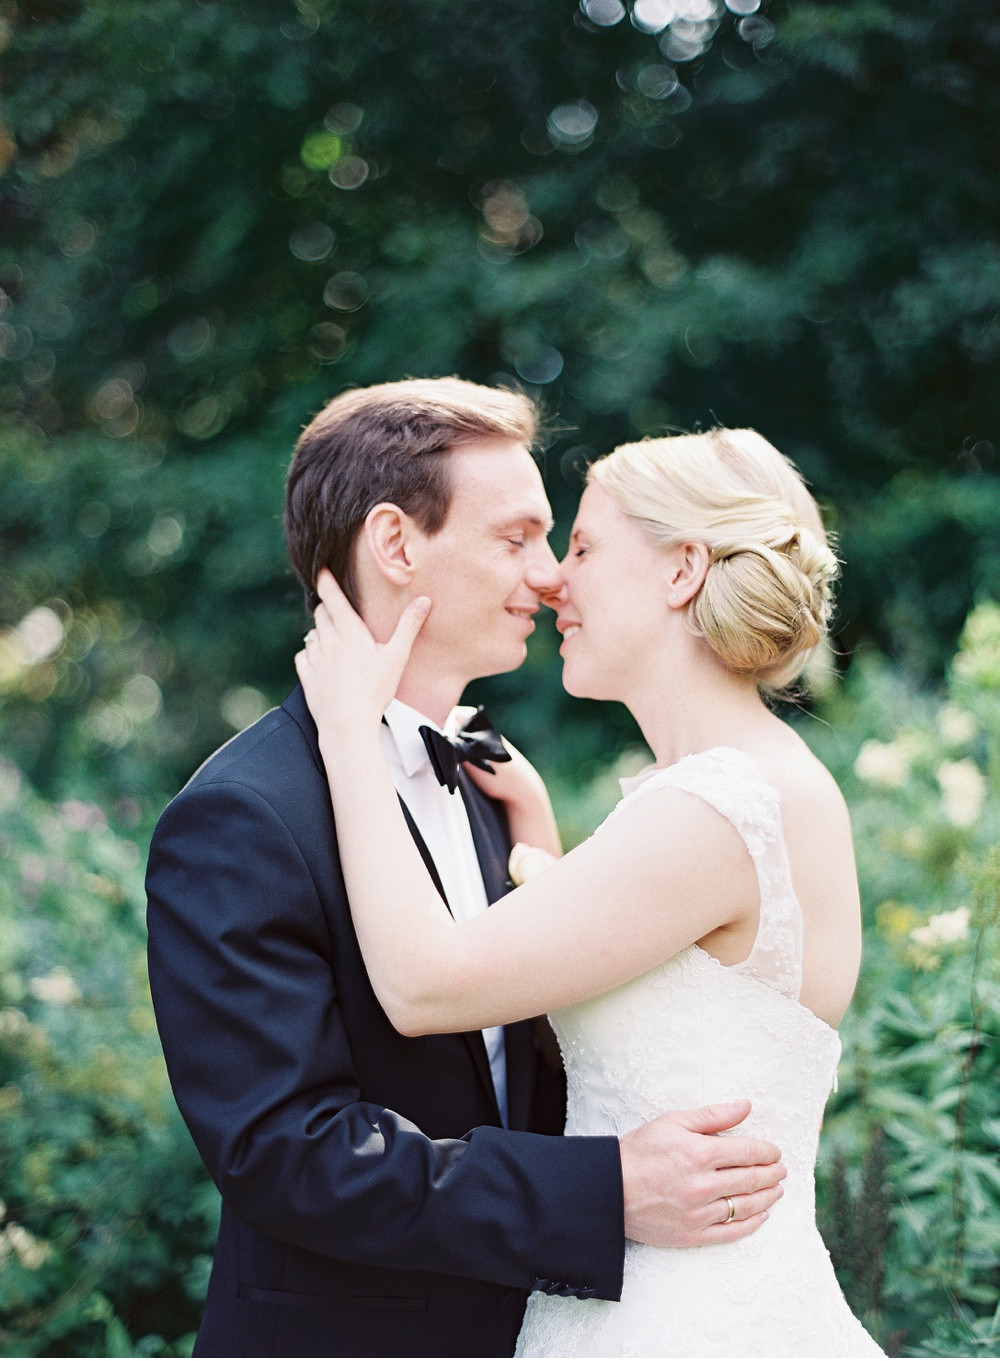 Classy_Norwegian_Wedding_WeddingPhotographer©MadalinaSheldon_0017.jpg